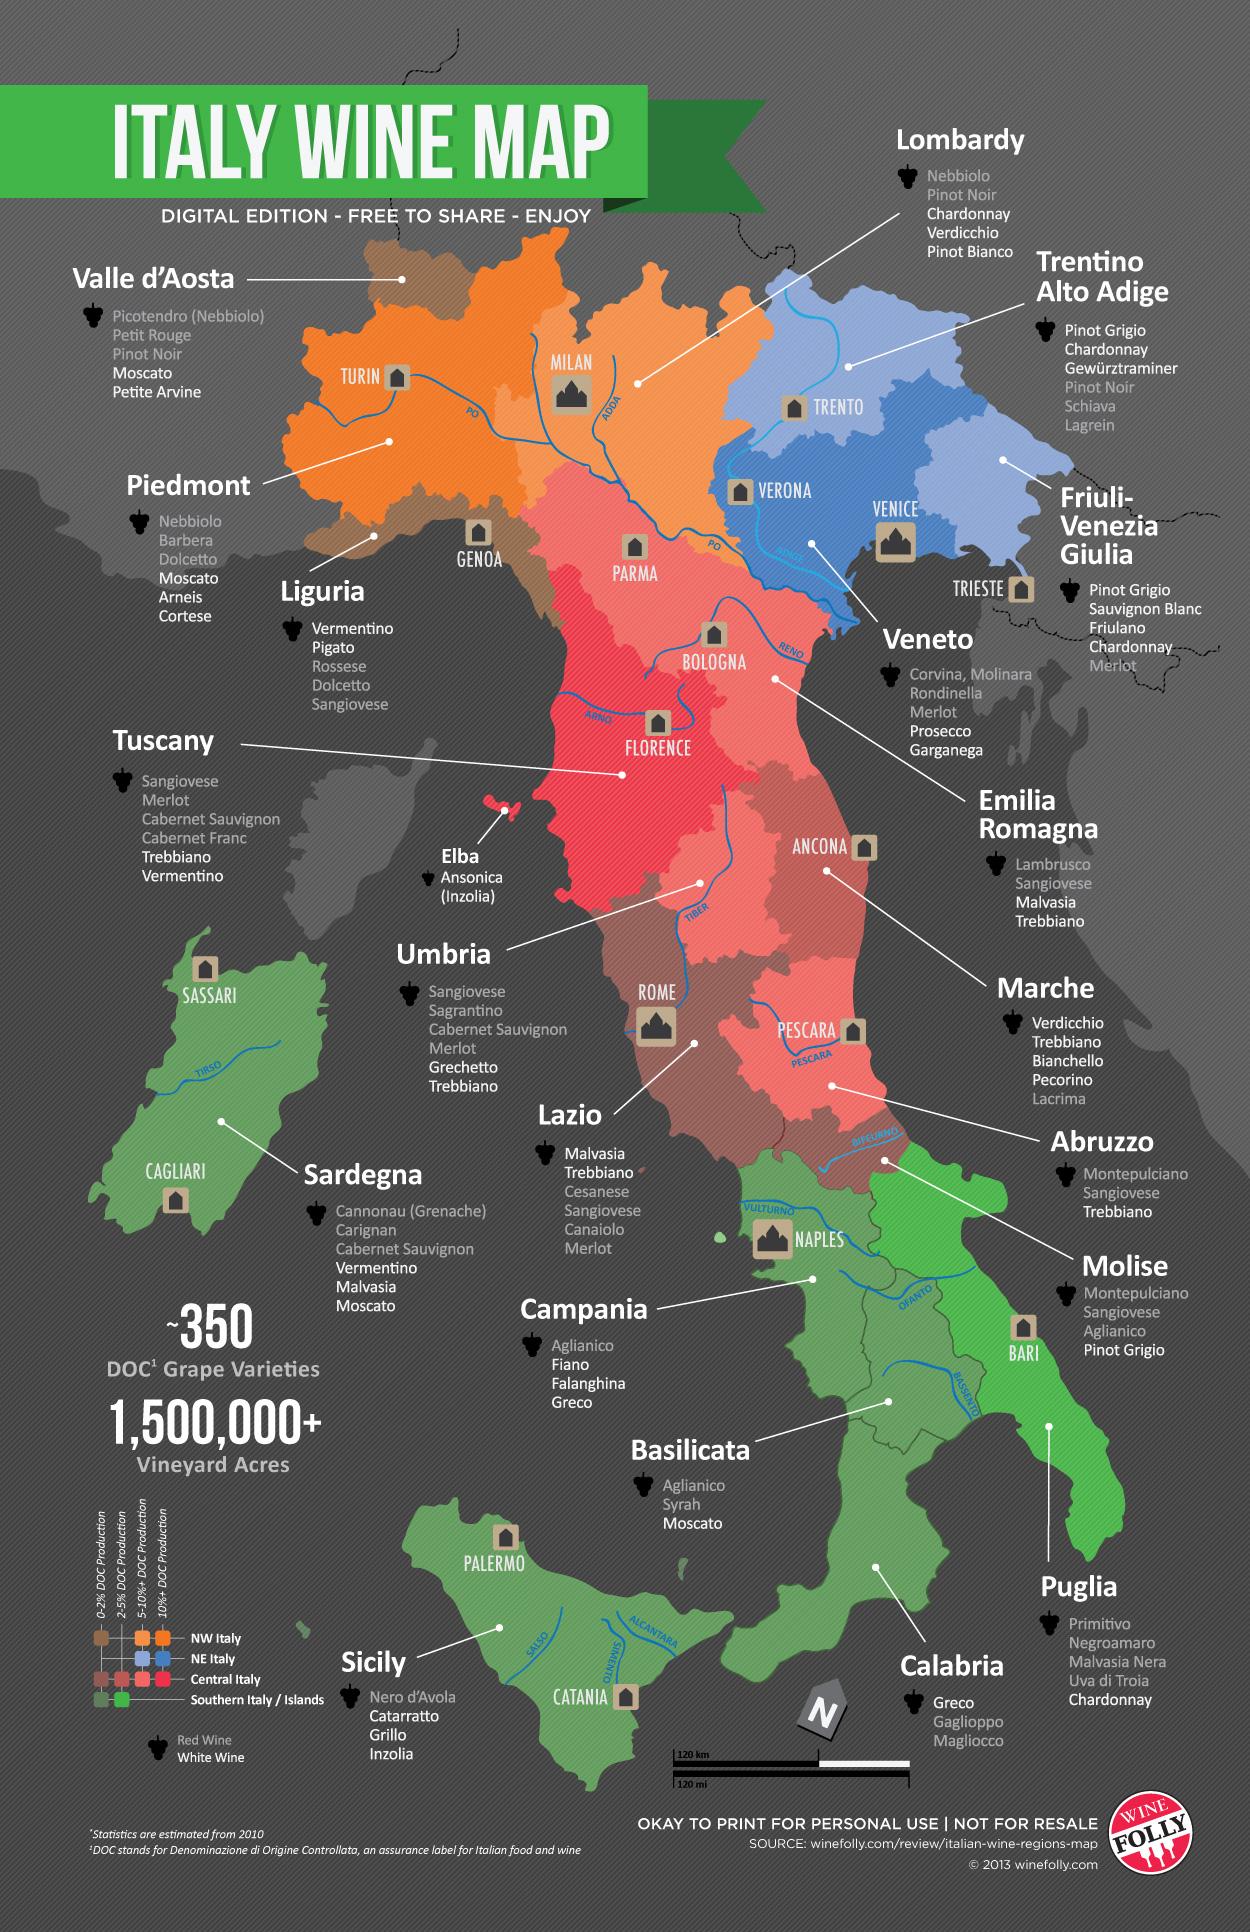 Source:  http://winefolly.com/review/italian-wine-regions-map/